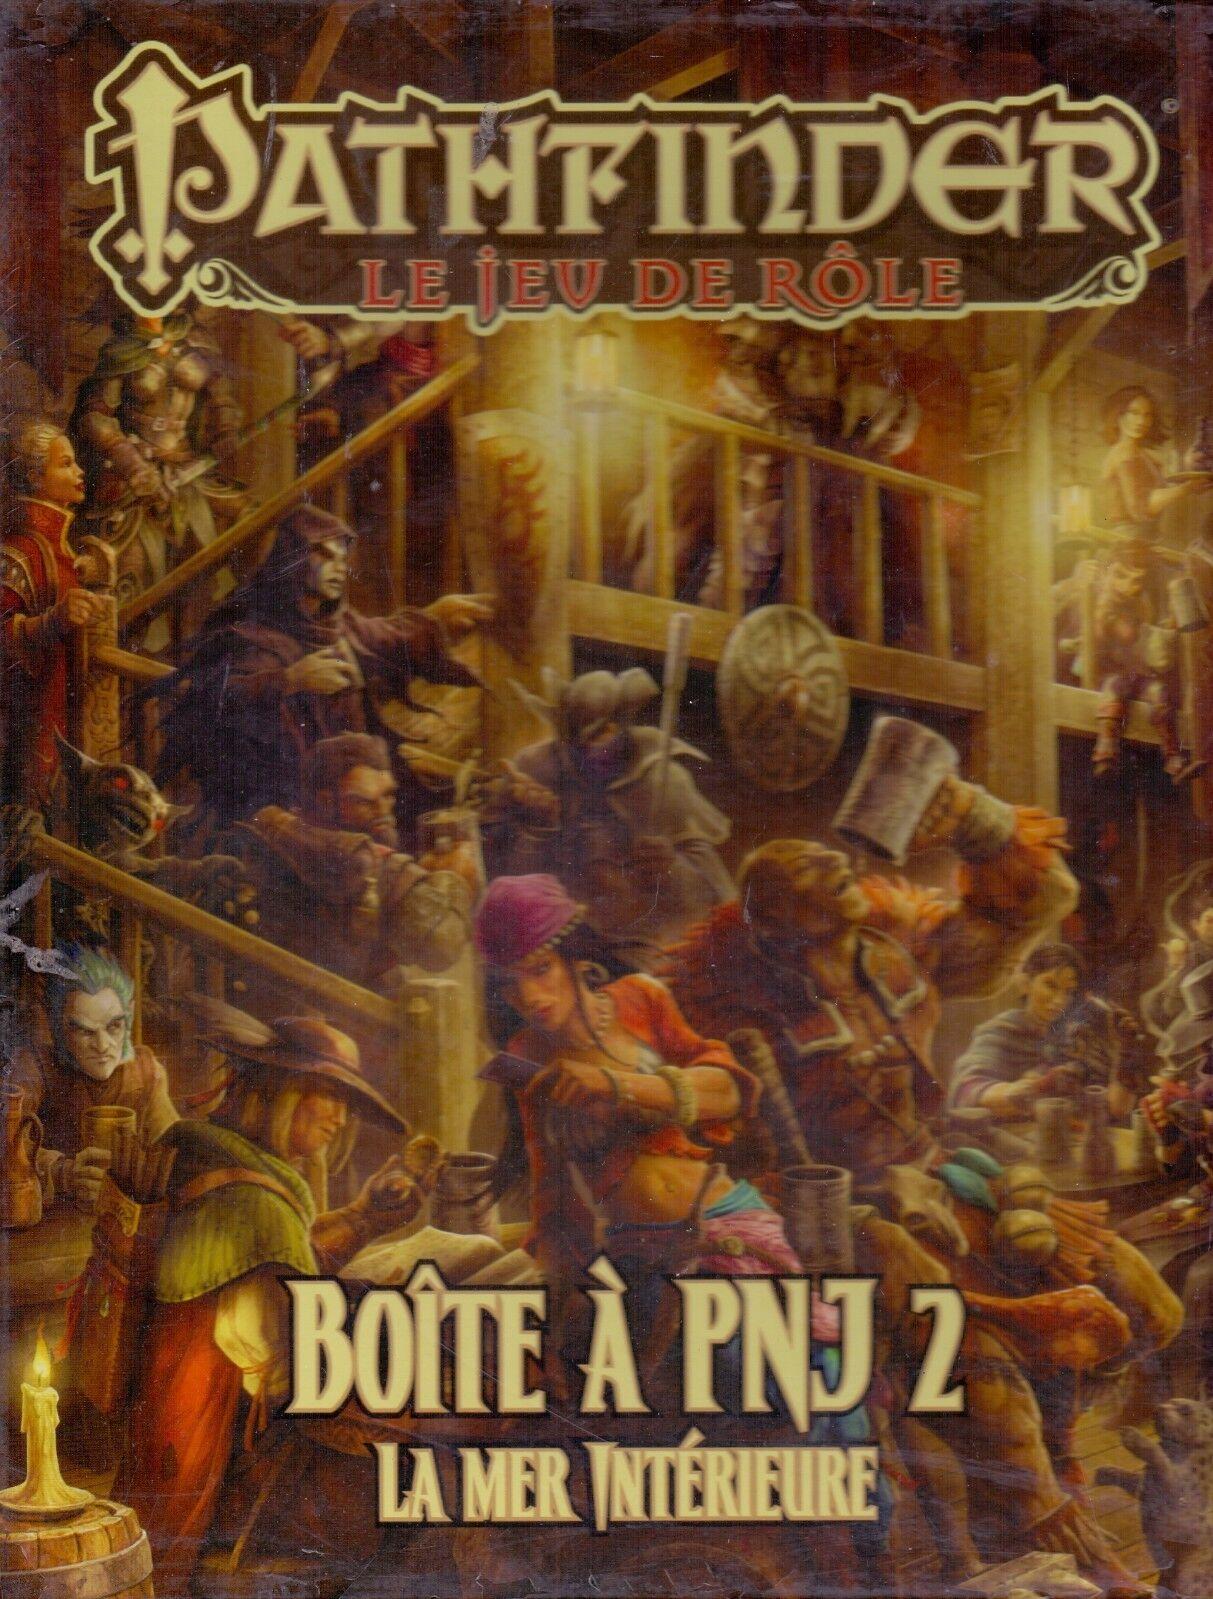 JDR RPG JEU DE ROLE     PATHFINDER BOITE A PNJ 2 164